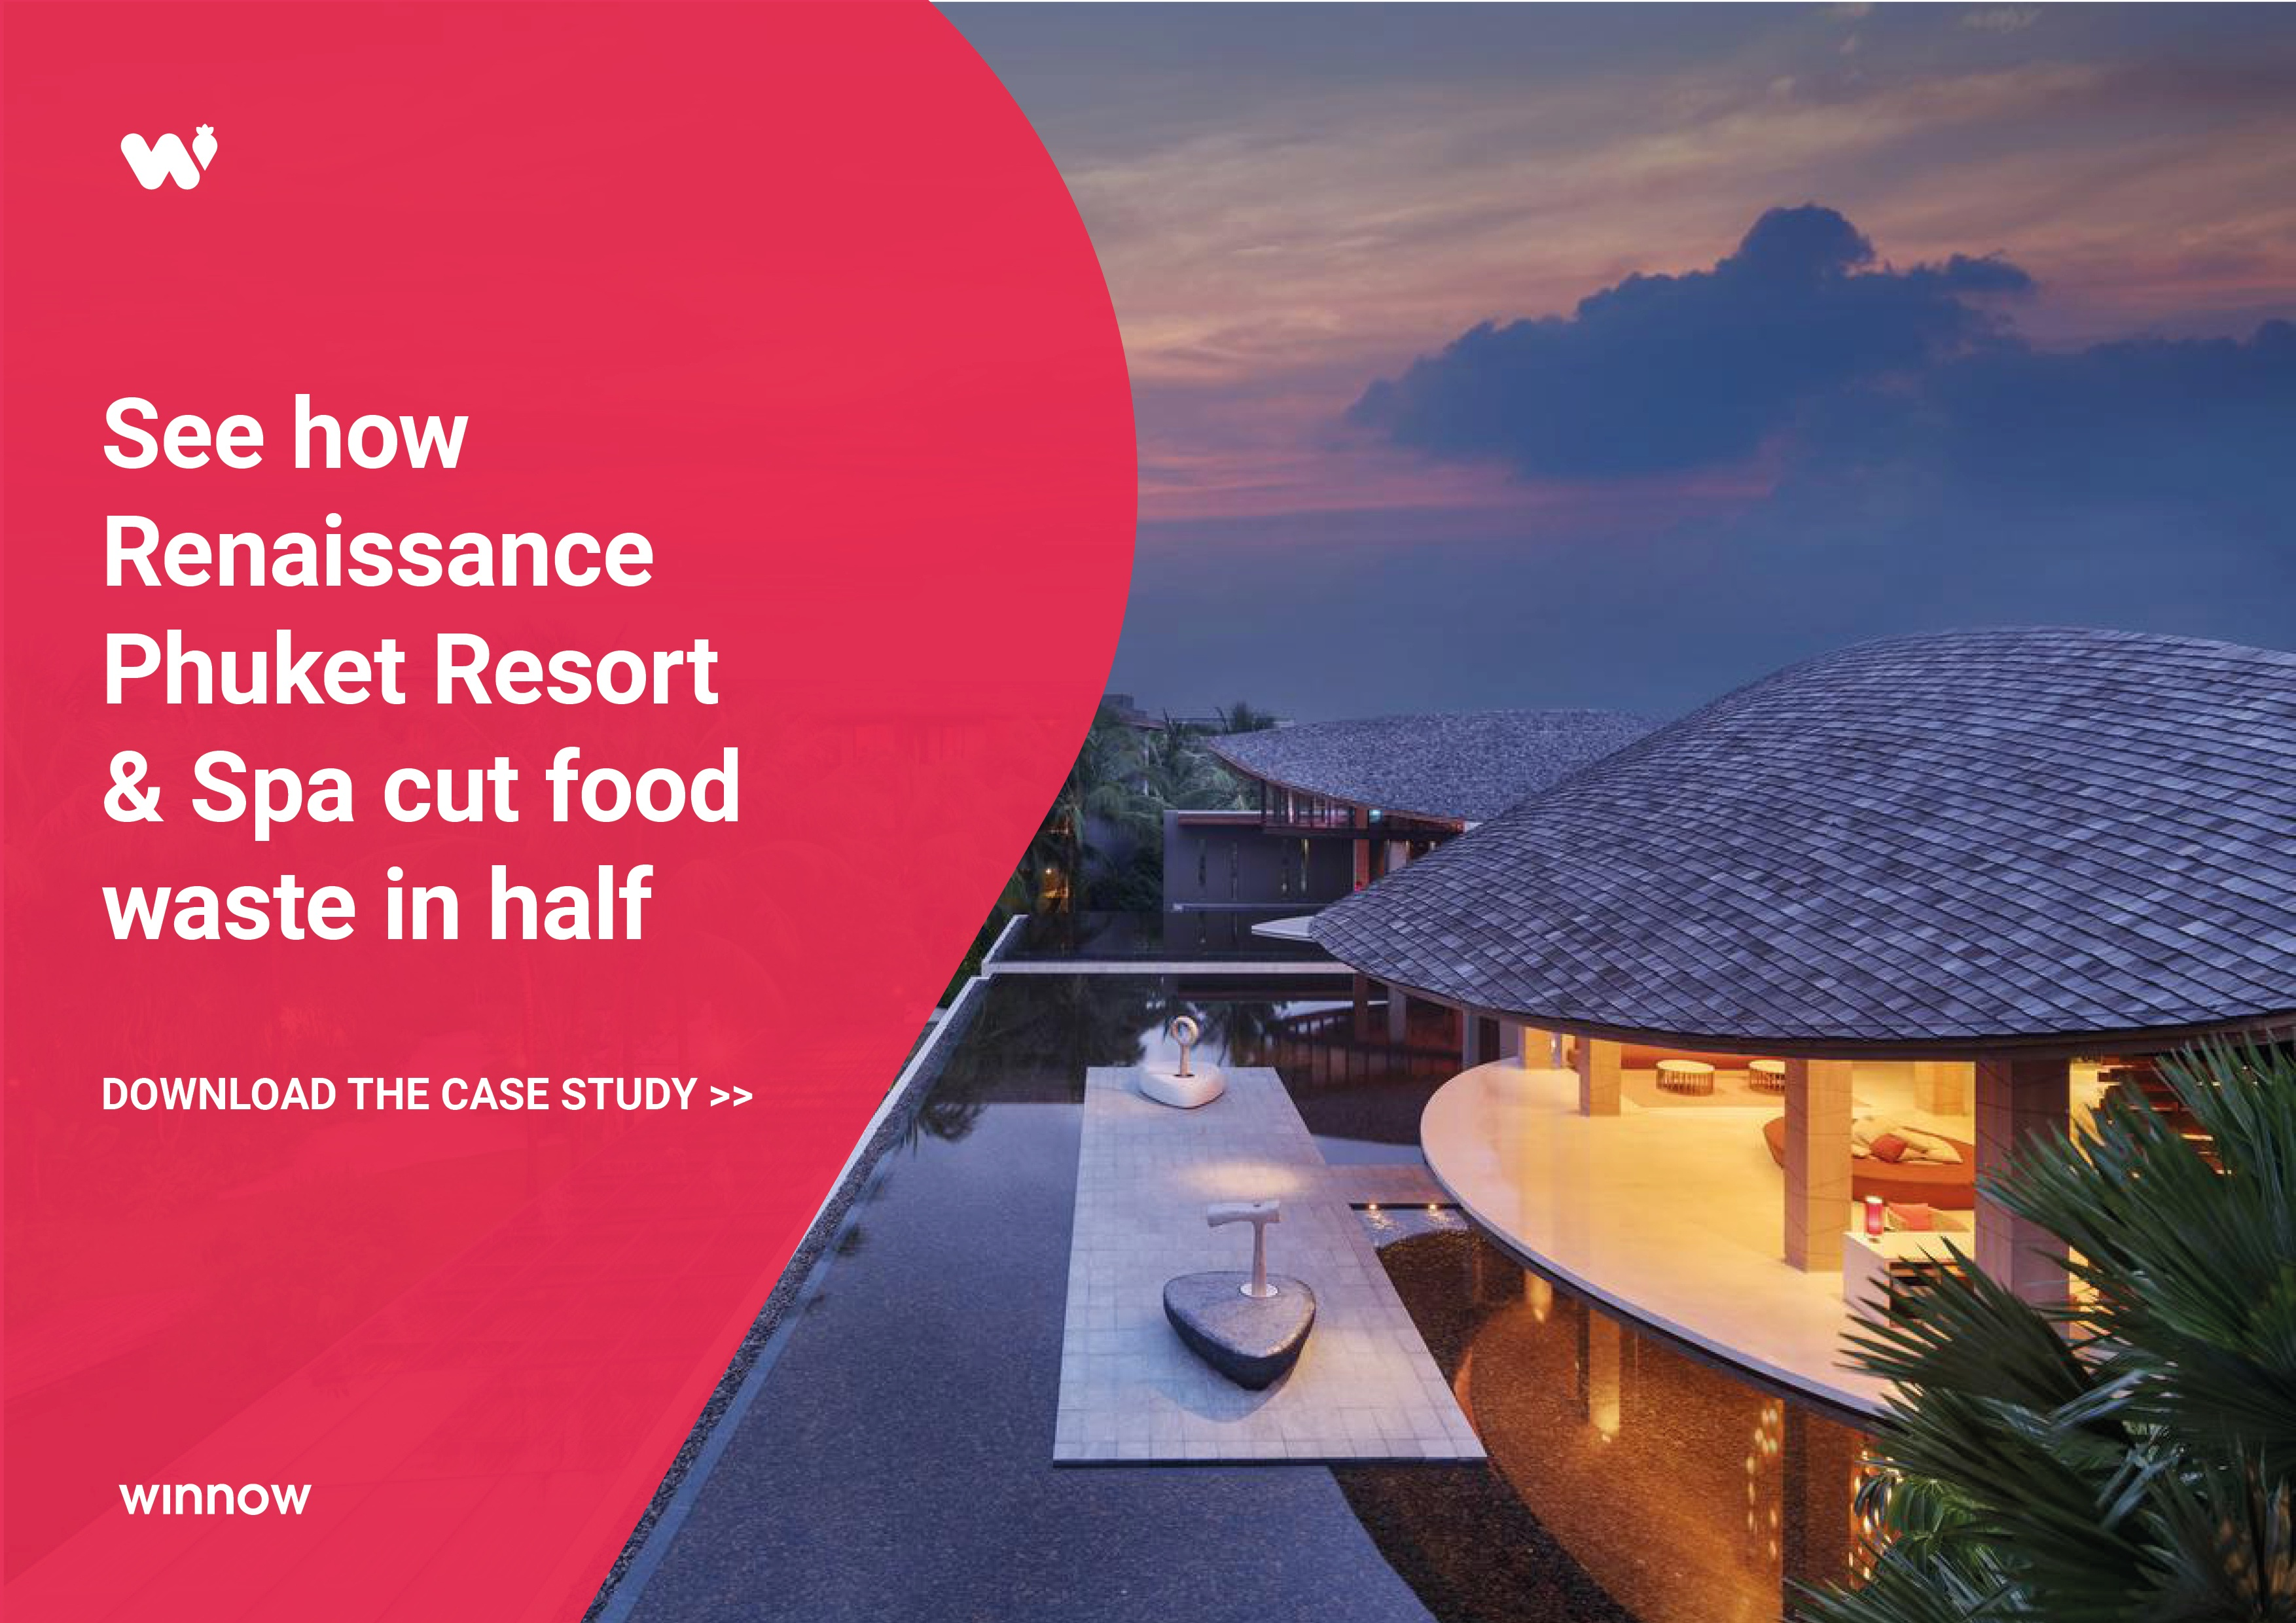 Renaissance Phuket cut food waste in half